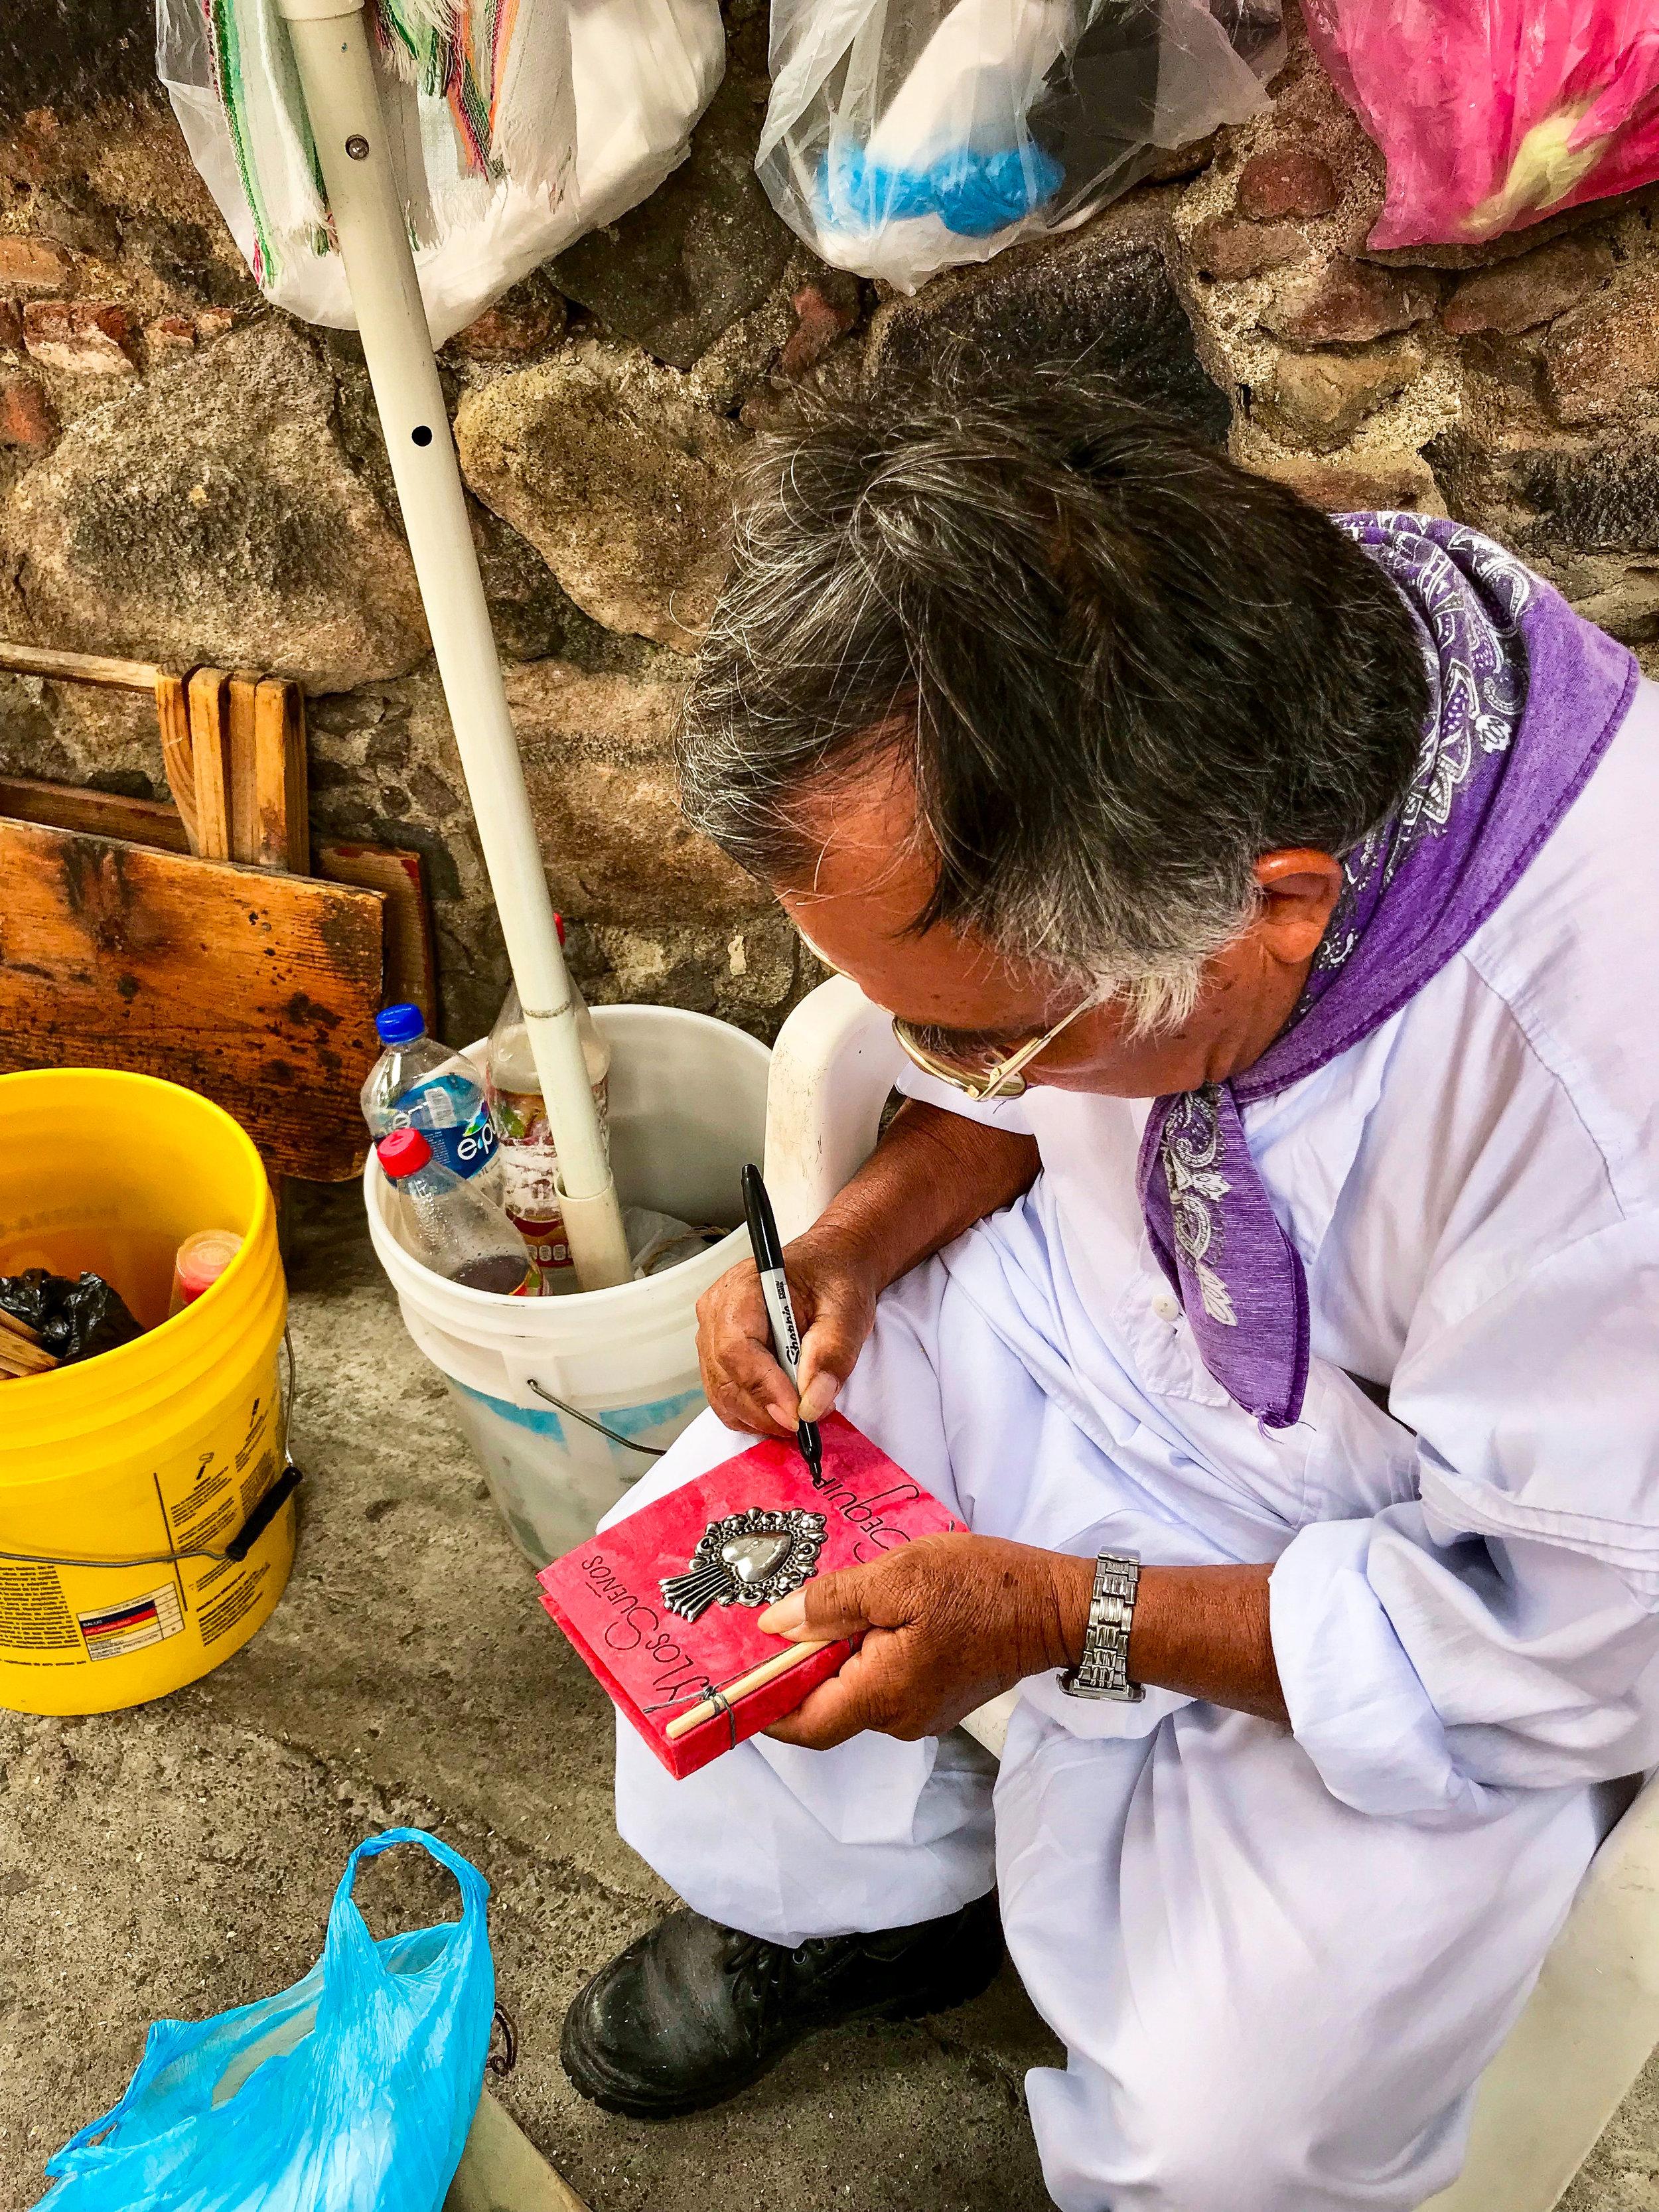 An Artisan making me a notepad in Door in San Miguel de Allende, Guanajuato, Mexico.